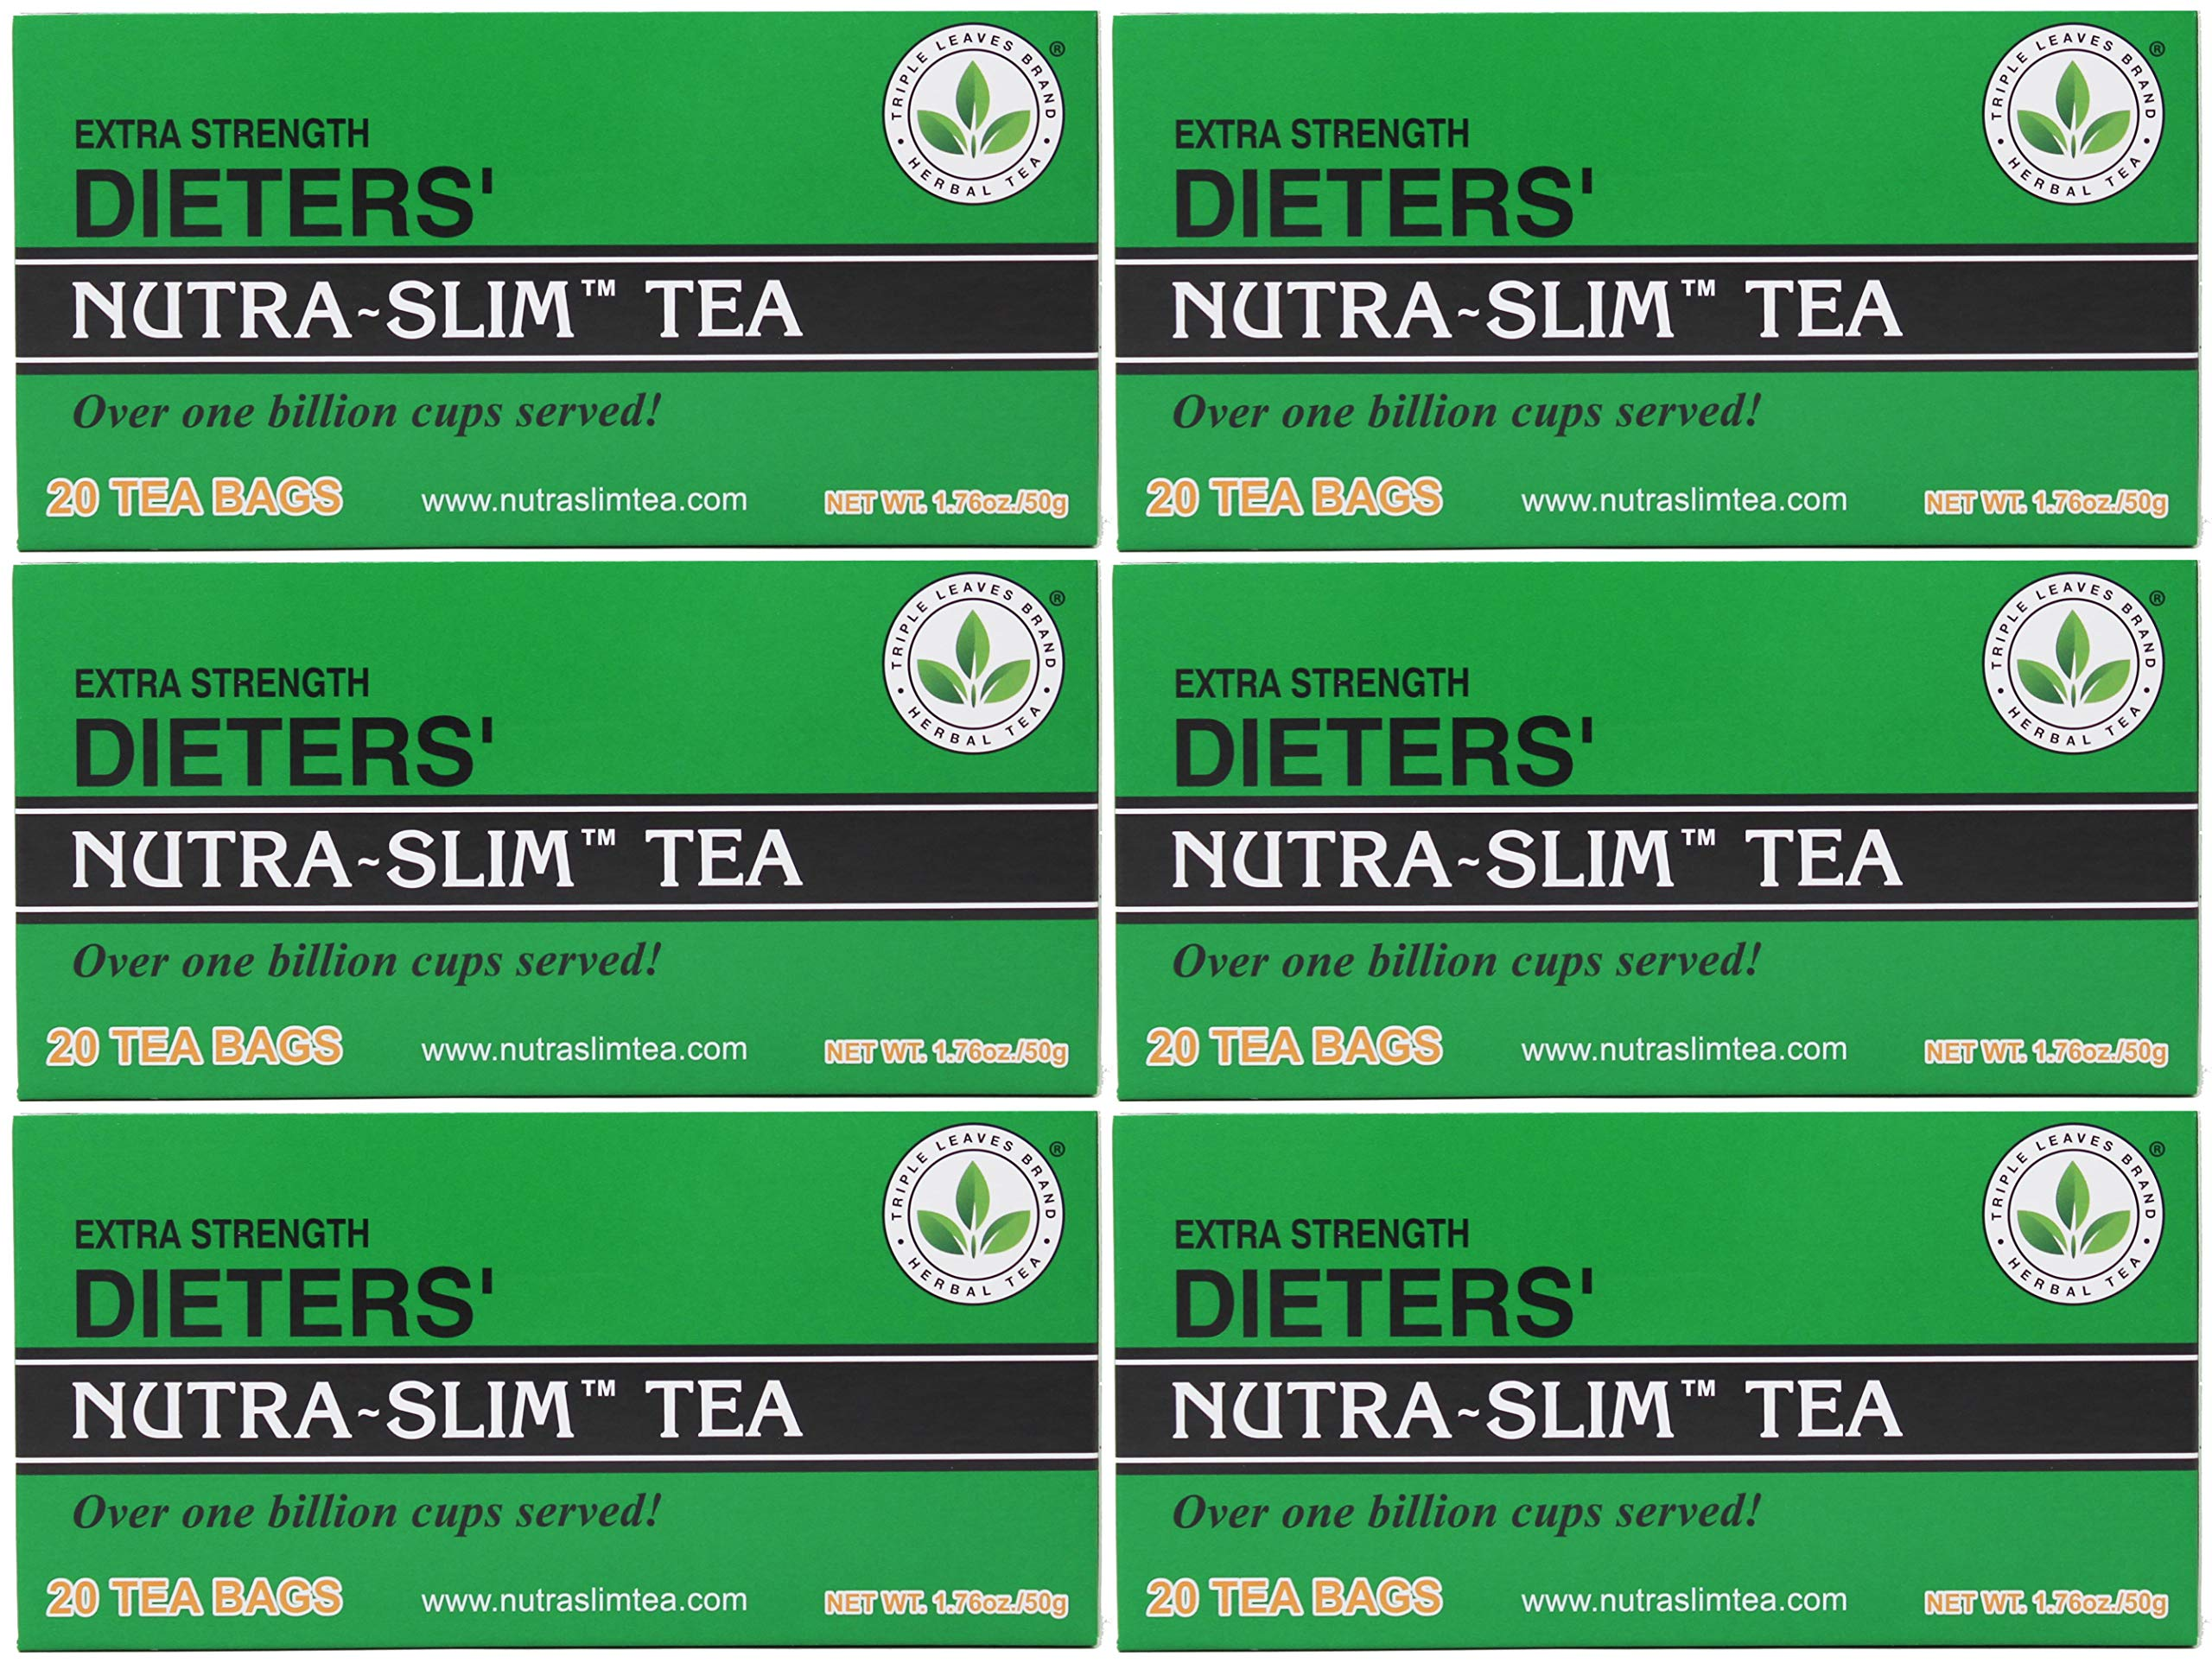 SIX BOXES of Triple Leaves Nutra-slim Tea 20 Tea Bags